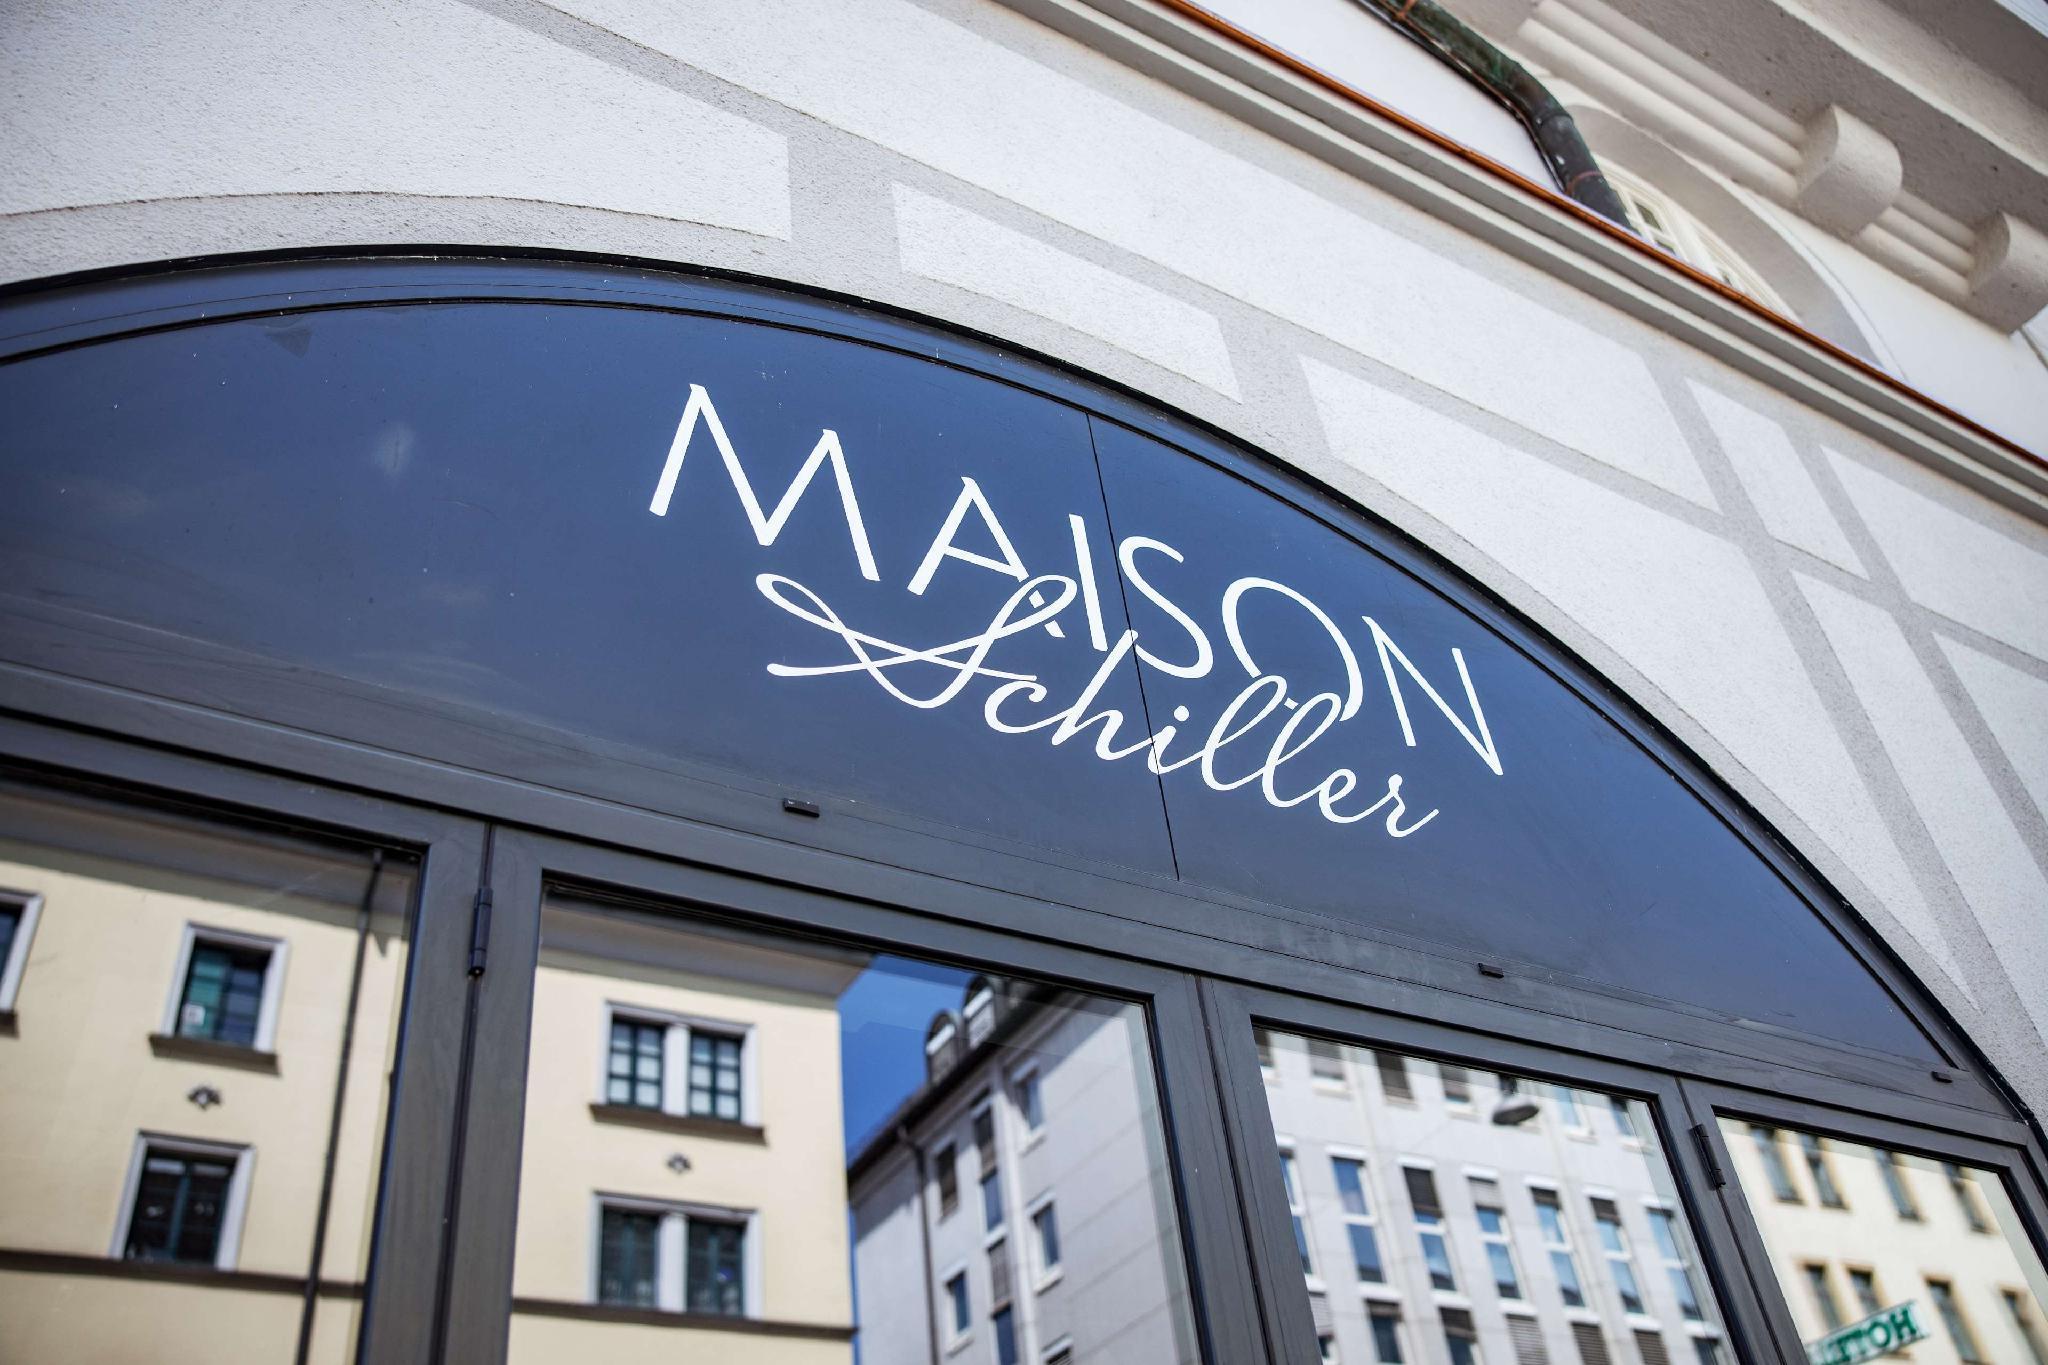 Maison Schiller By DesignCity Hotels